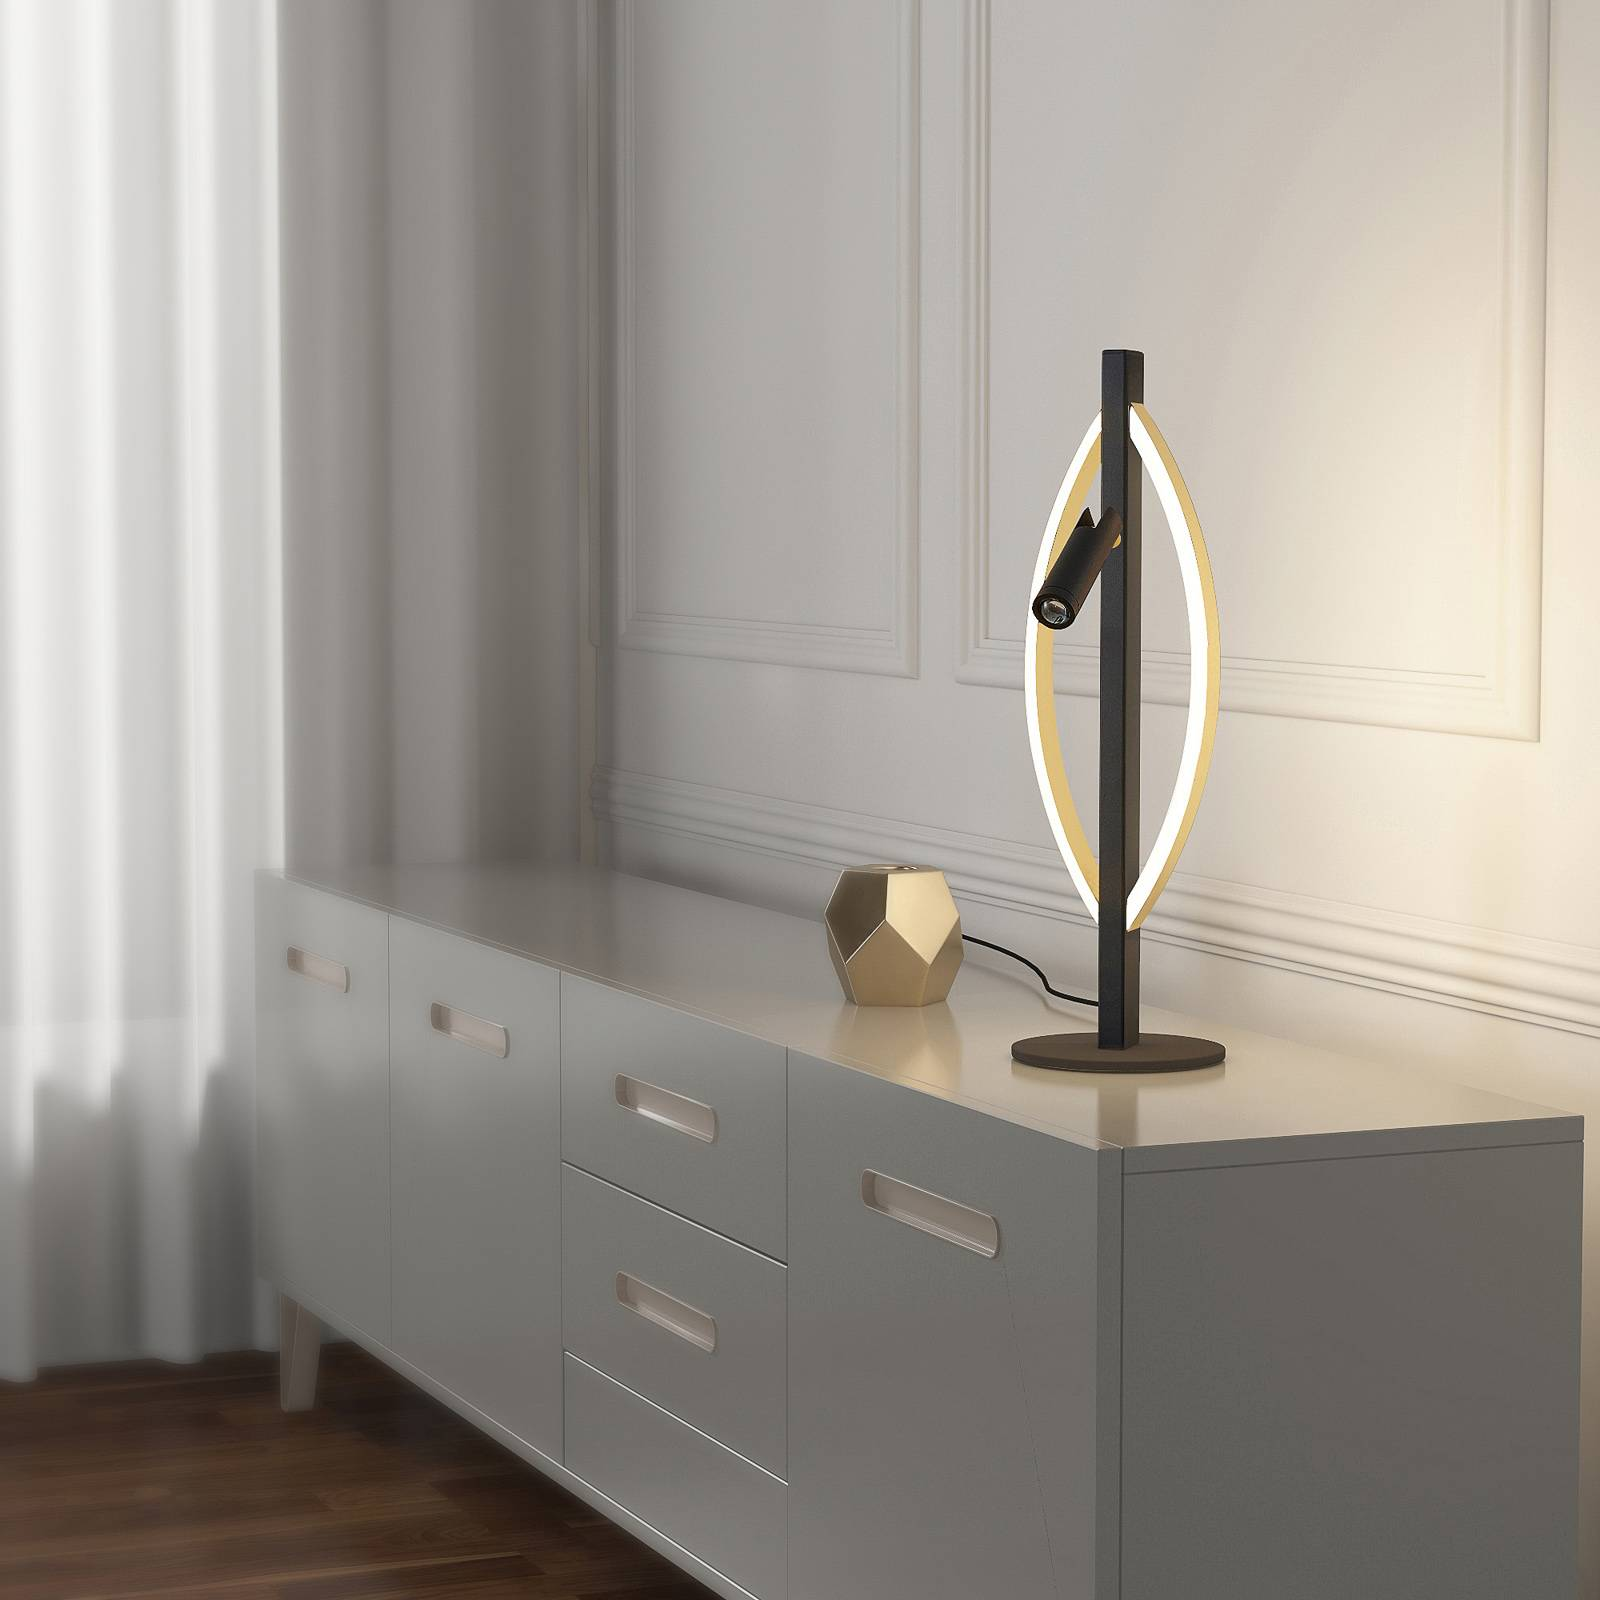 Lucande Matwei LED tafellamp, ovaal, messing